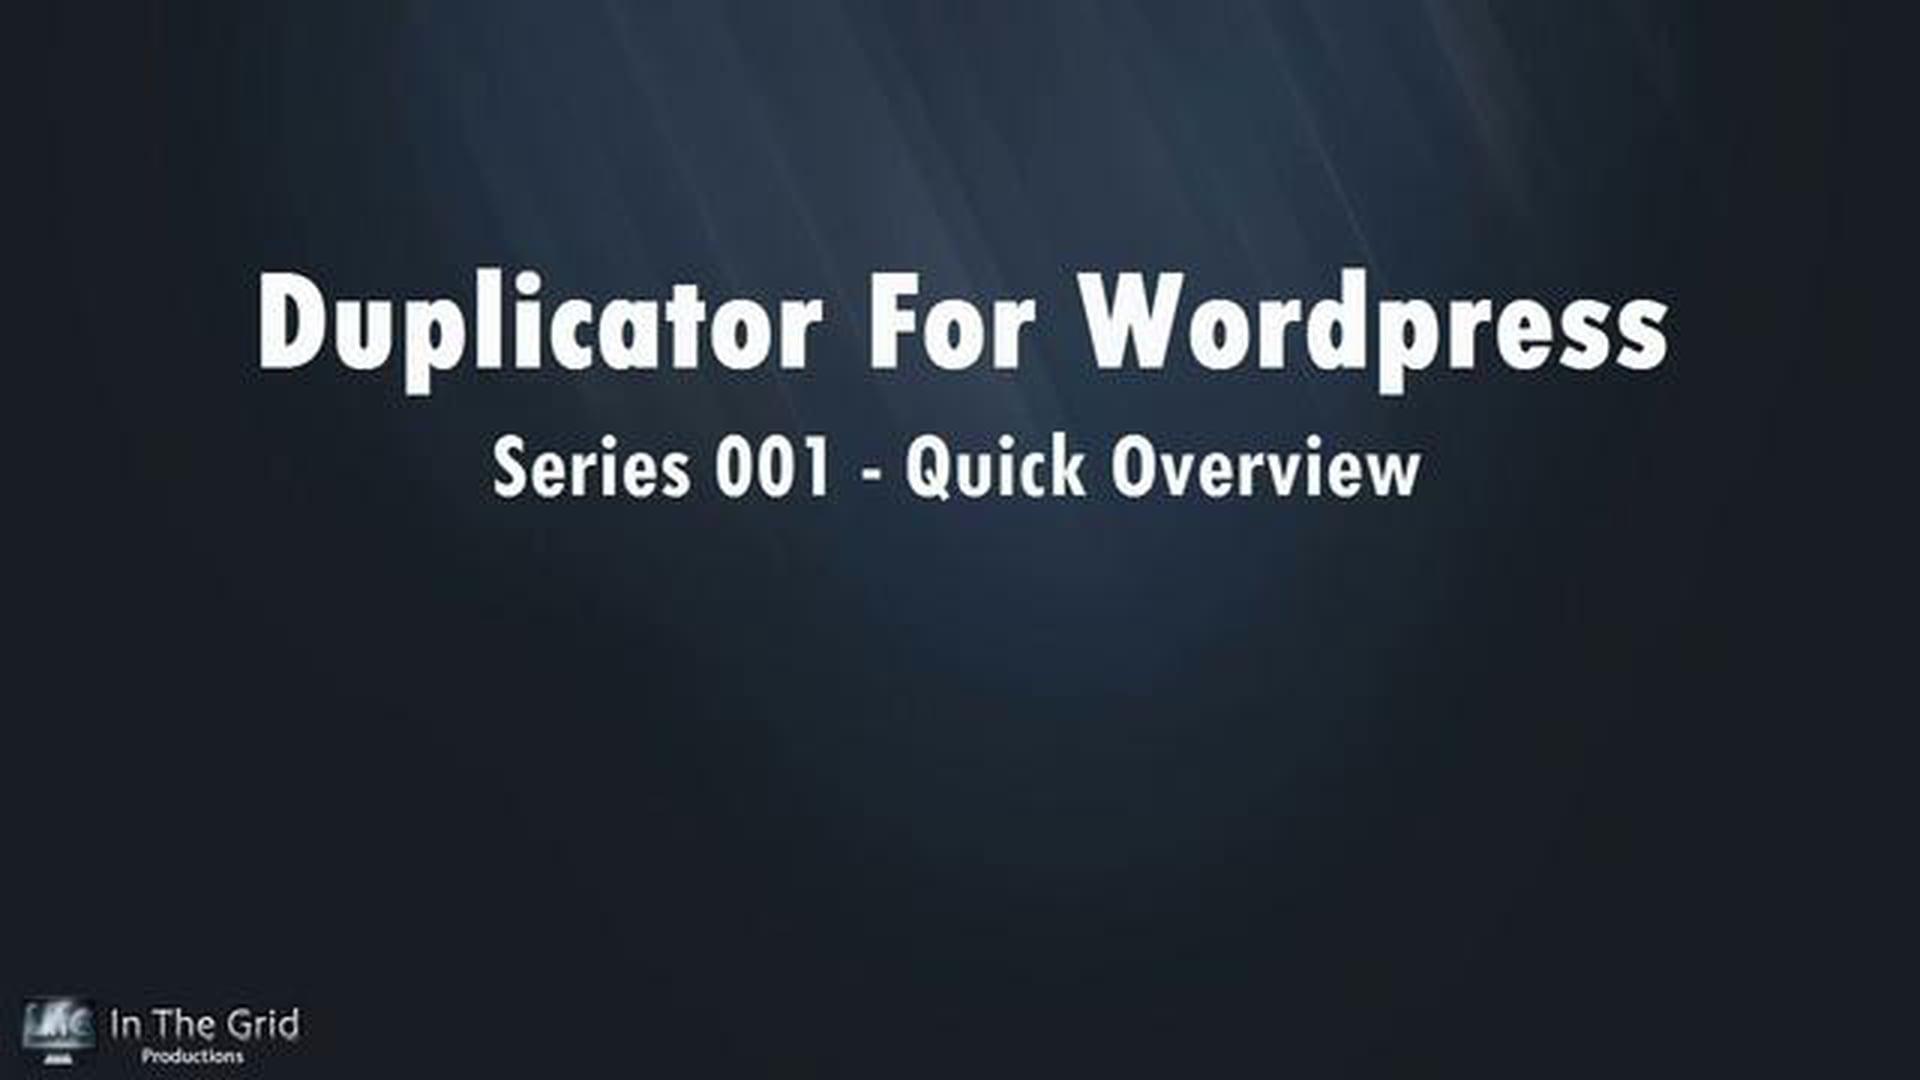 Duplicator For WordPress: Series 001 – Quick Overview